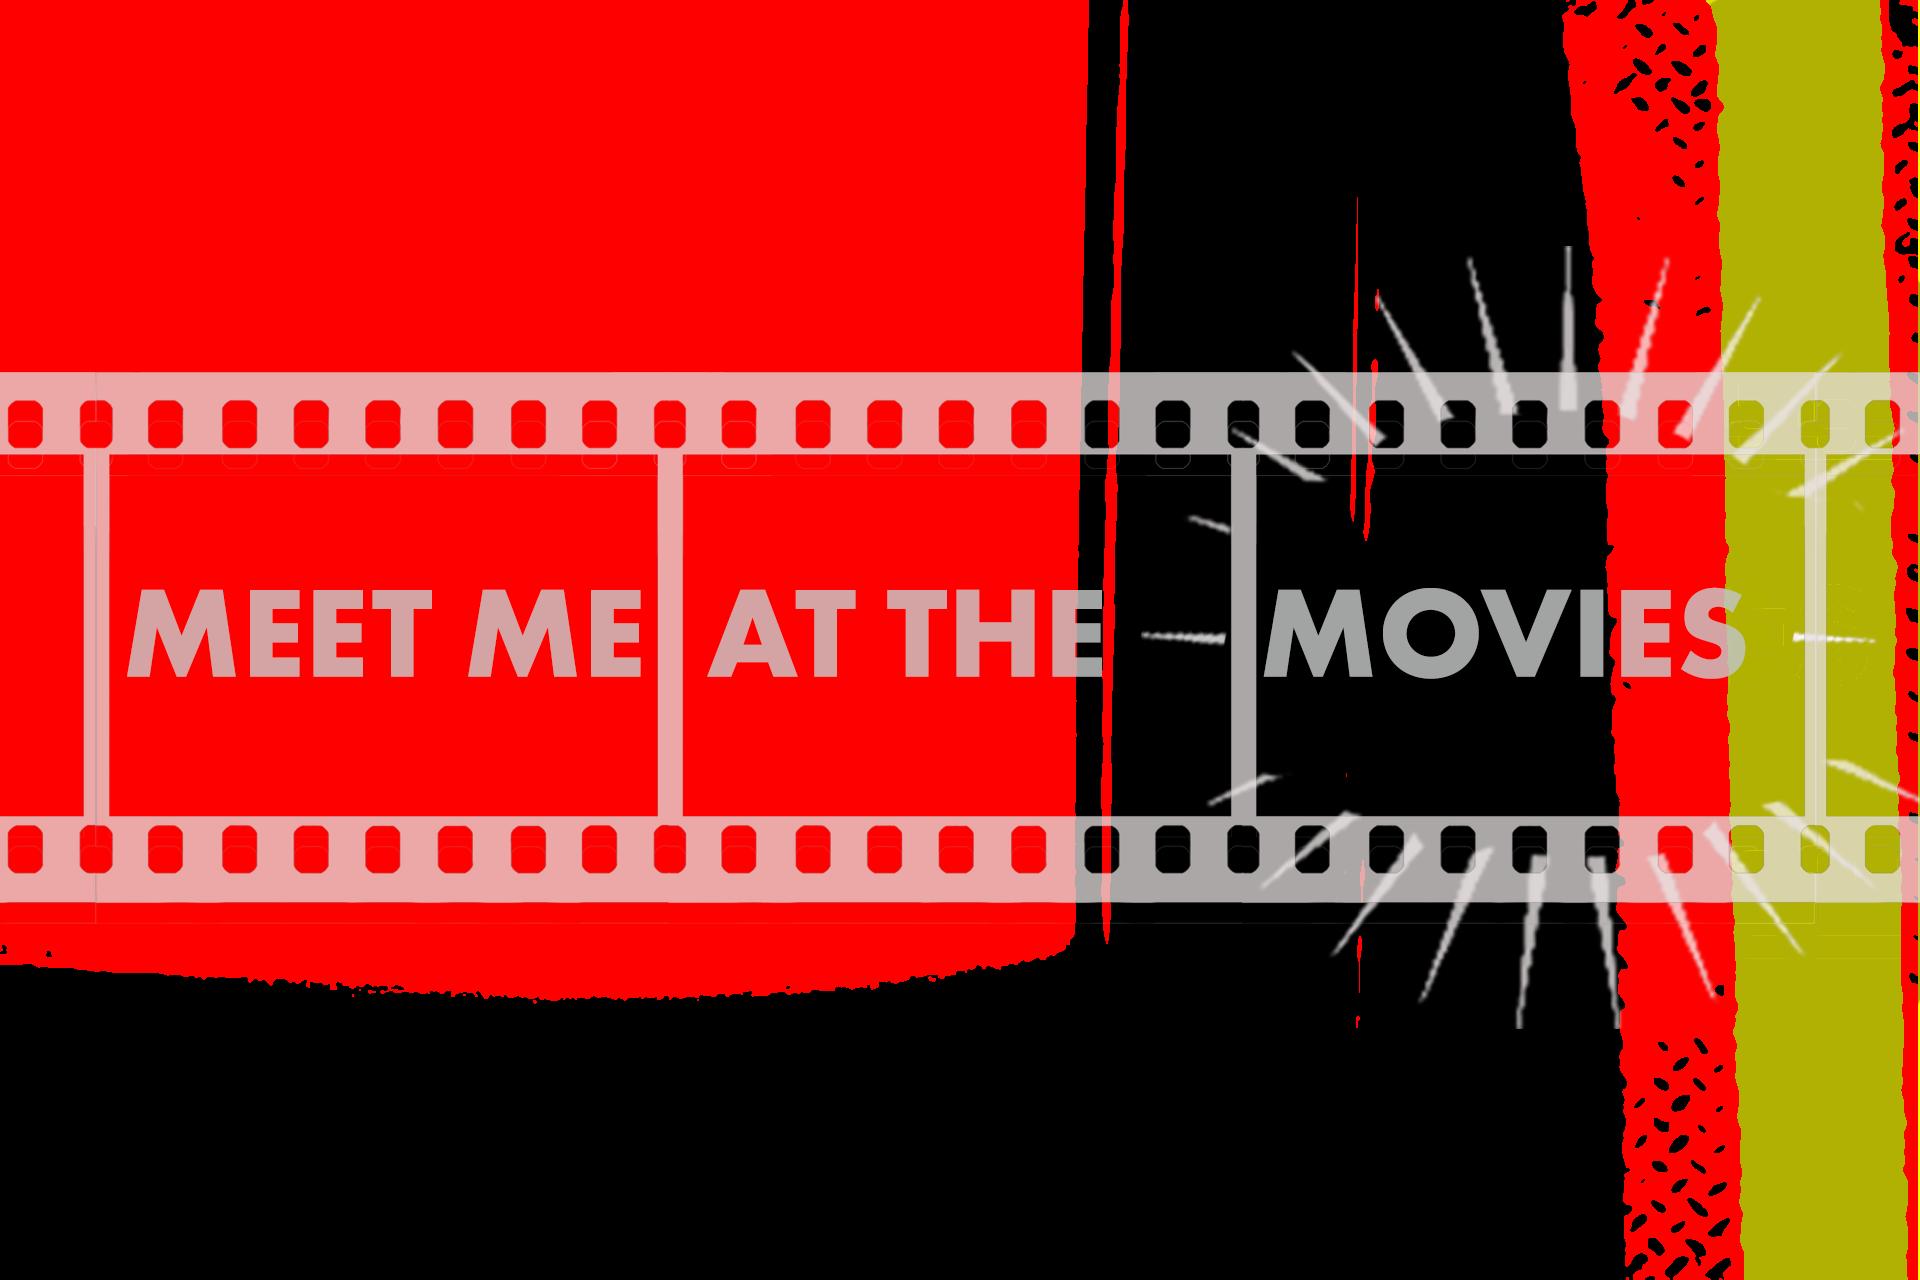 Meet me at the Movies large starburst.png